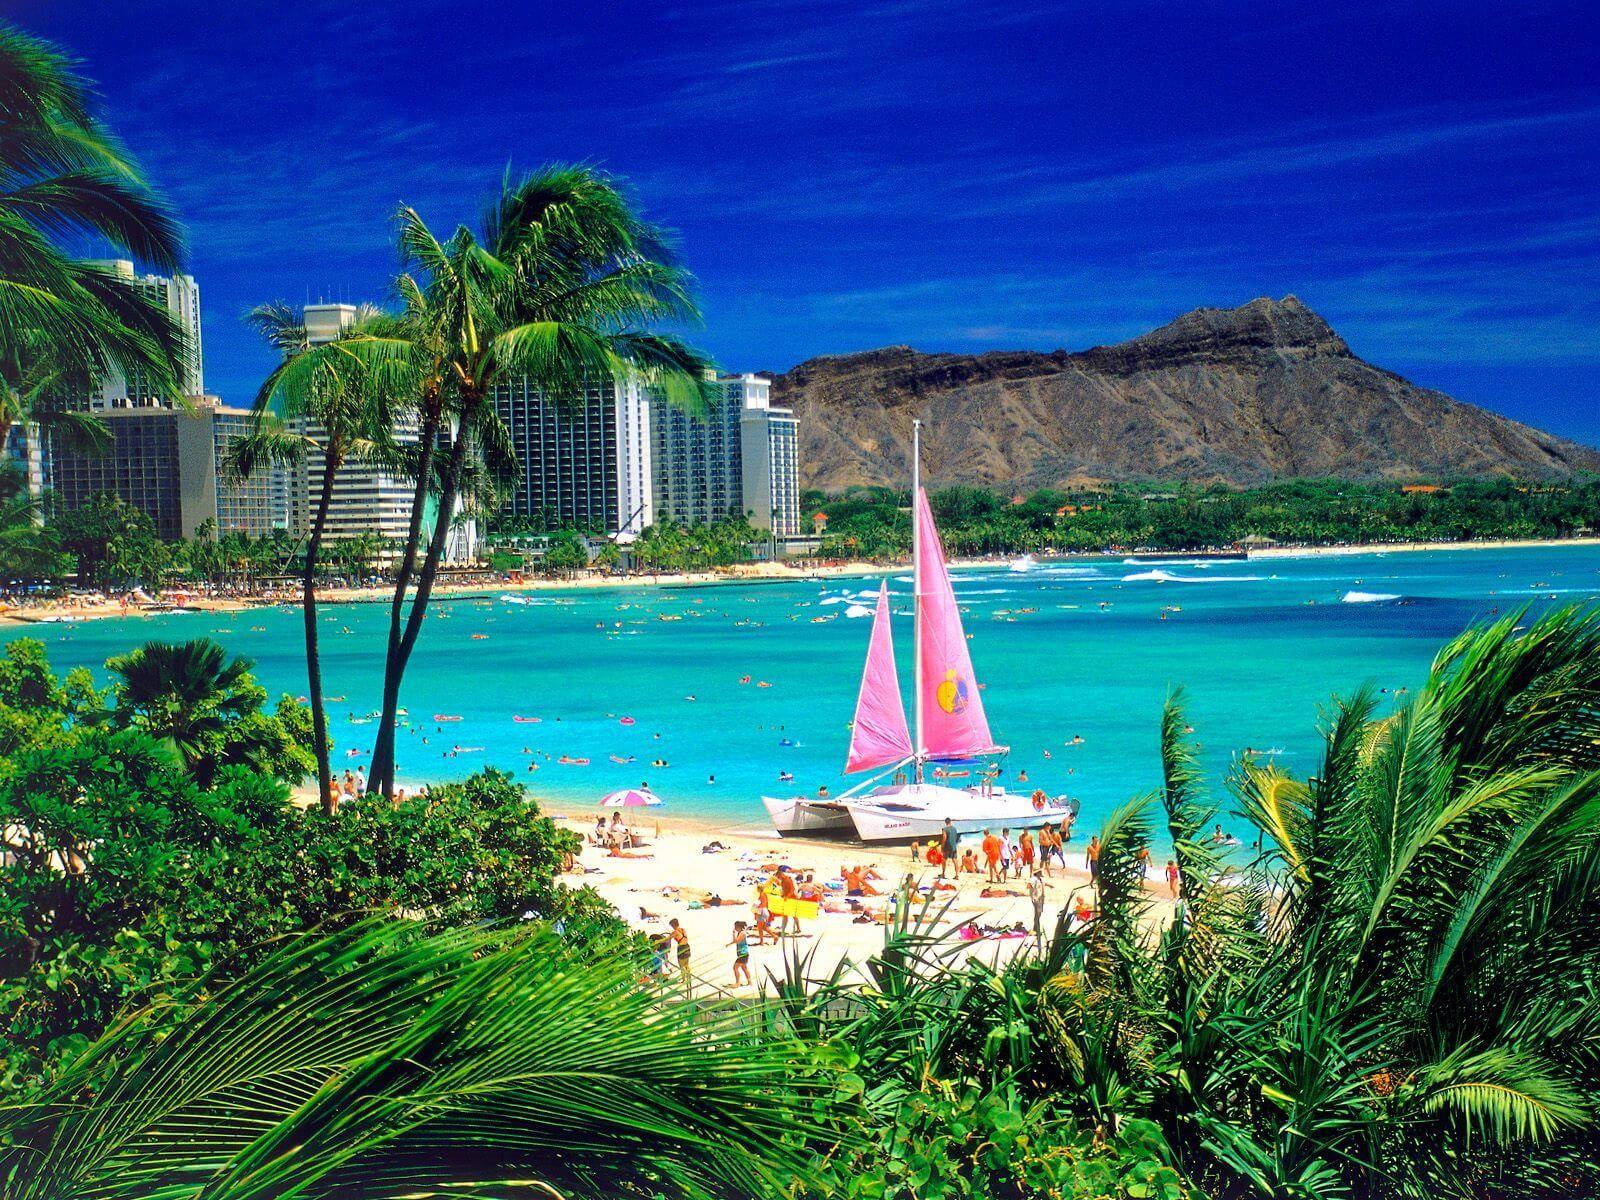 Waikiki Oahu Hawaii Normal   Hd Wallpapers High Definition 100 1600x1200